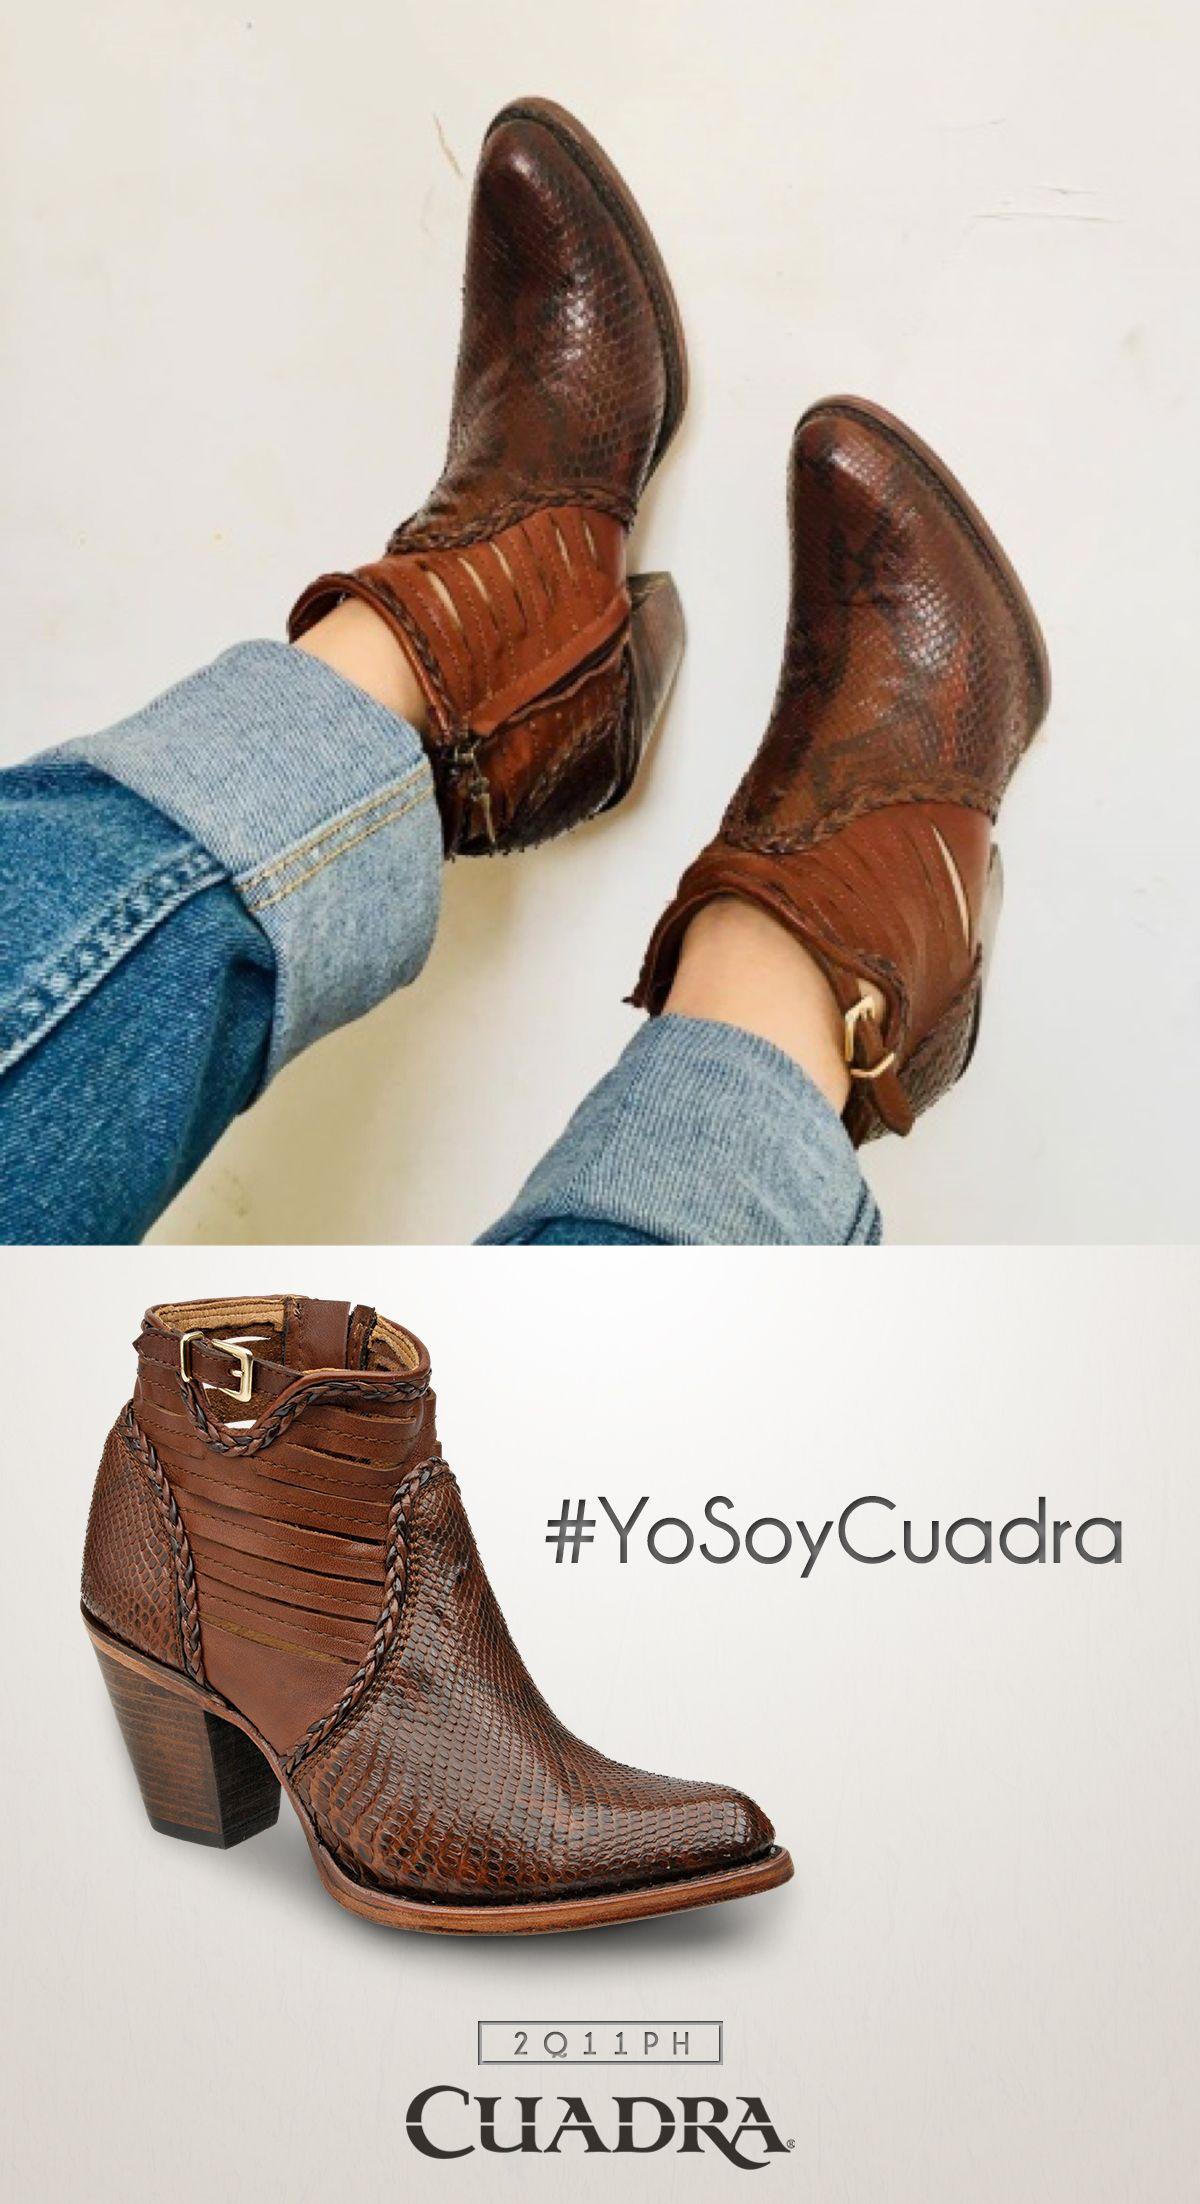 6c9398a1e2f54 Mi estilo es Cuadra.  shoesoftheday  shoelover  shoesaddict  ootd ...